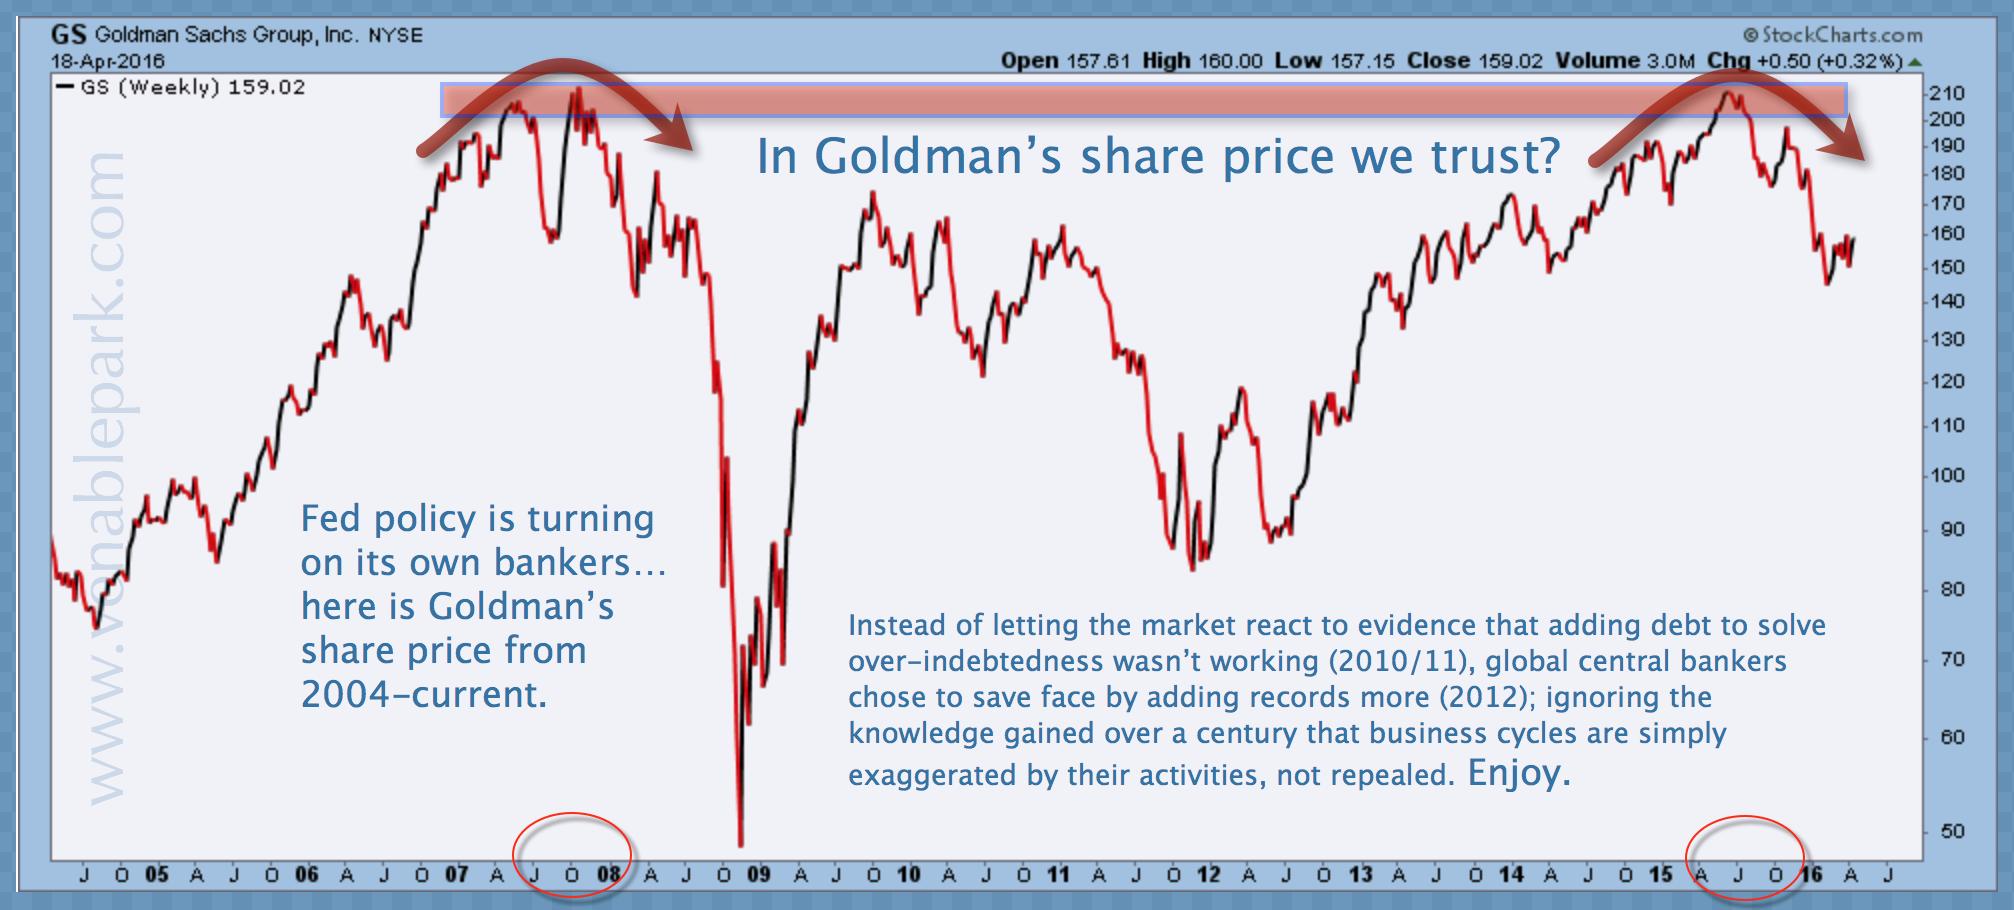 Goldman Sachs April 19 2016